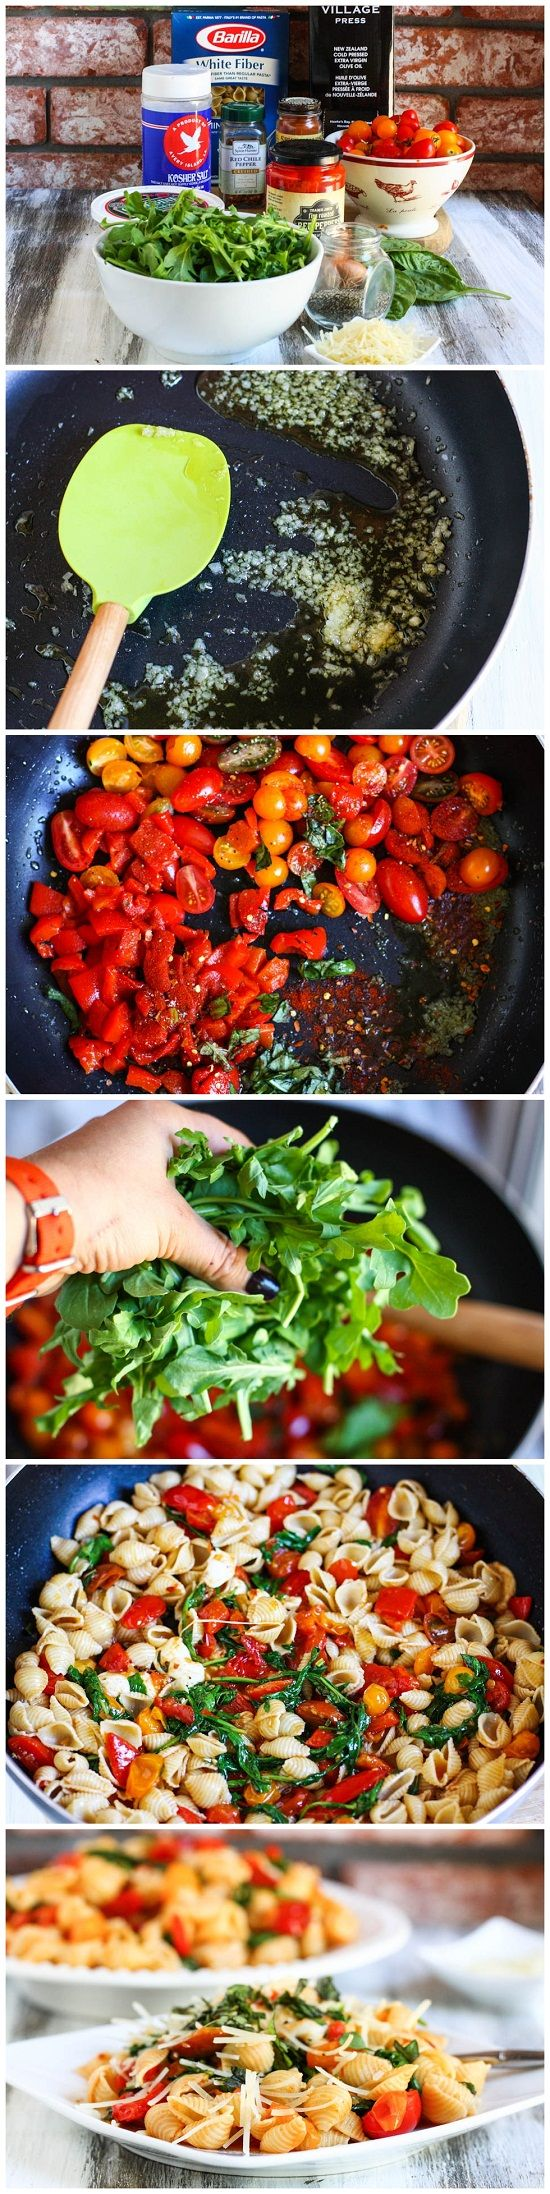 this looks sooo good. Tomato, Roasted Pepper and Arugula Pasta